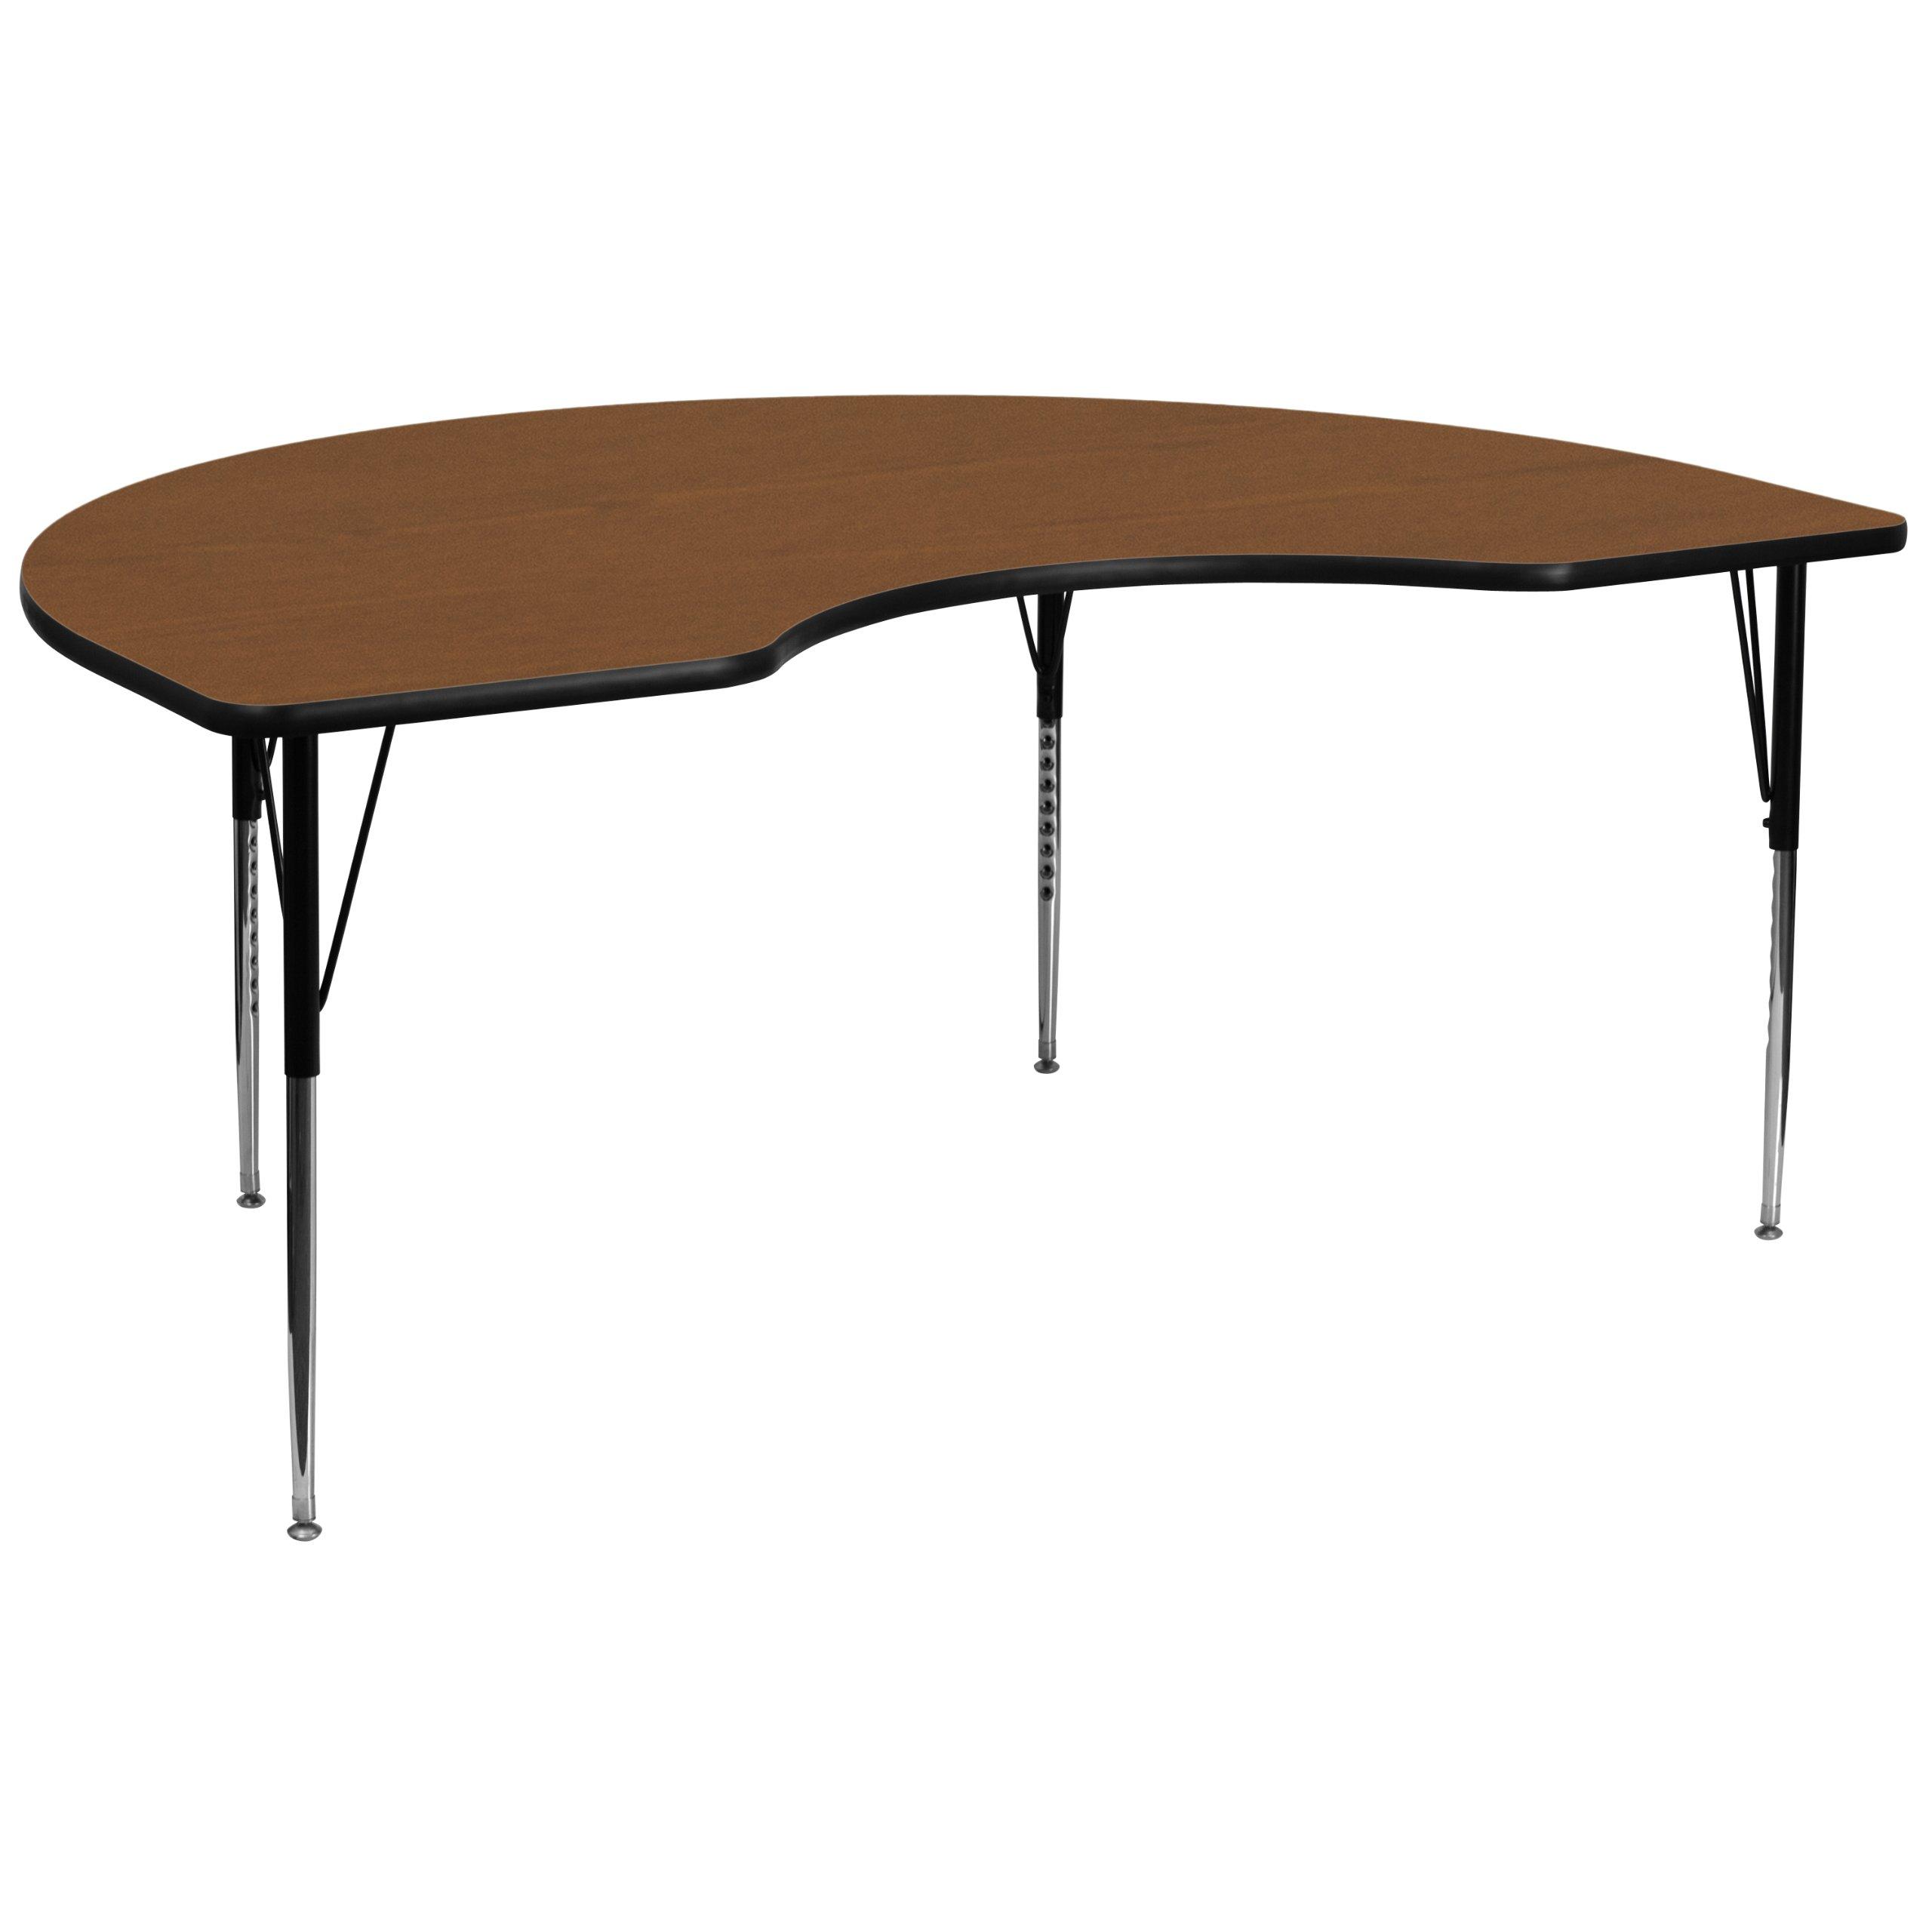 Flash Furniture 48''W x 96''L Kidney Oak HP Laminate Activity Table - Standard Height Adjustable Legs